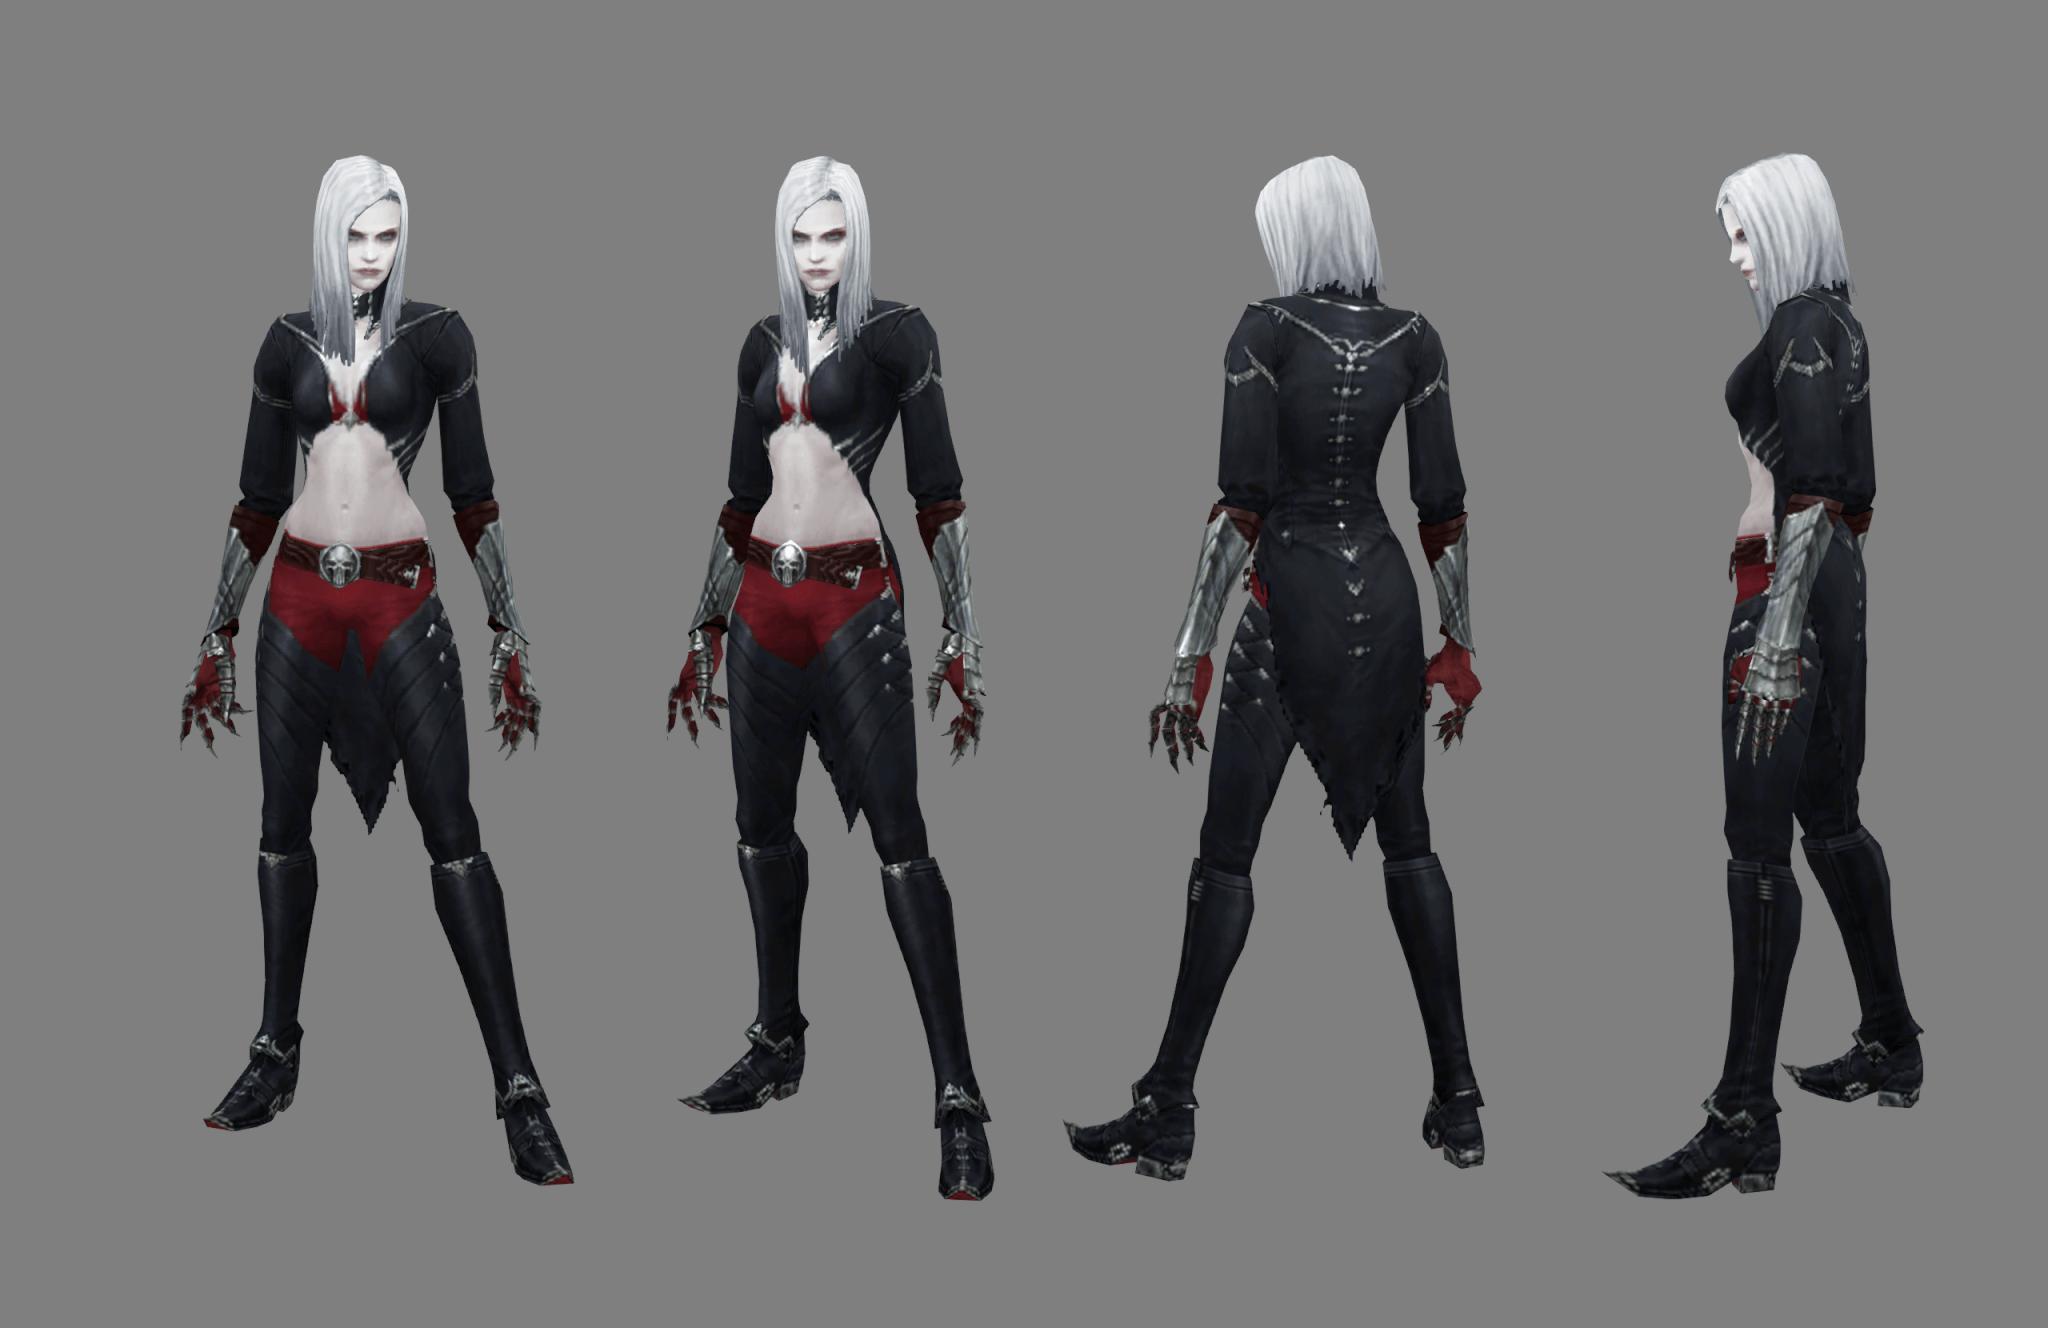 The female Necromancer.